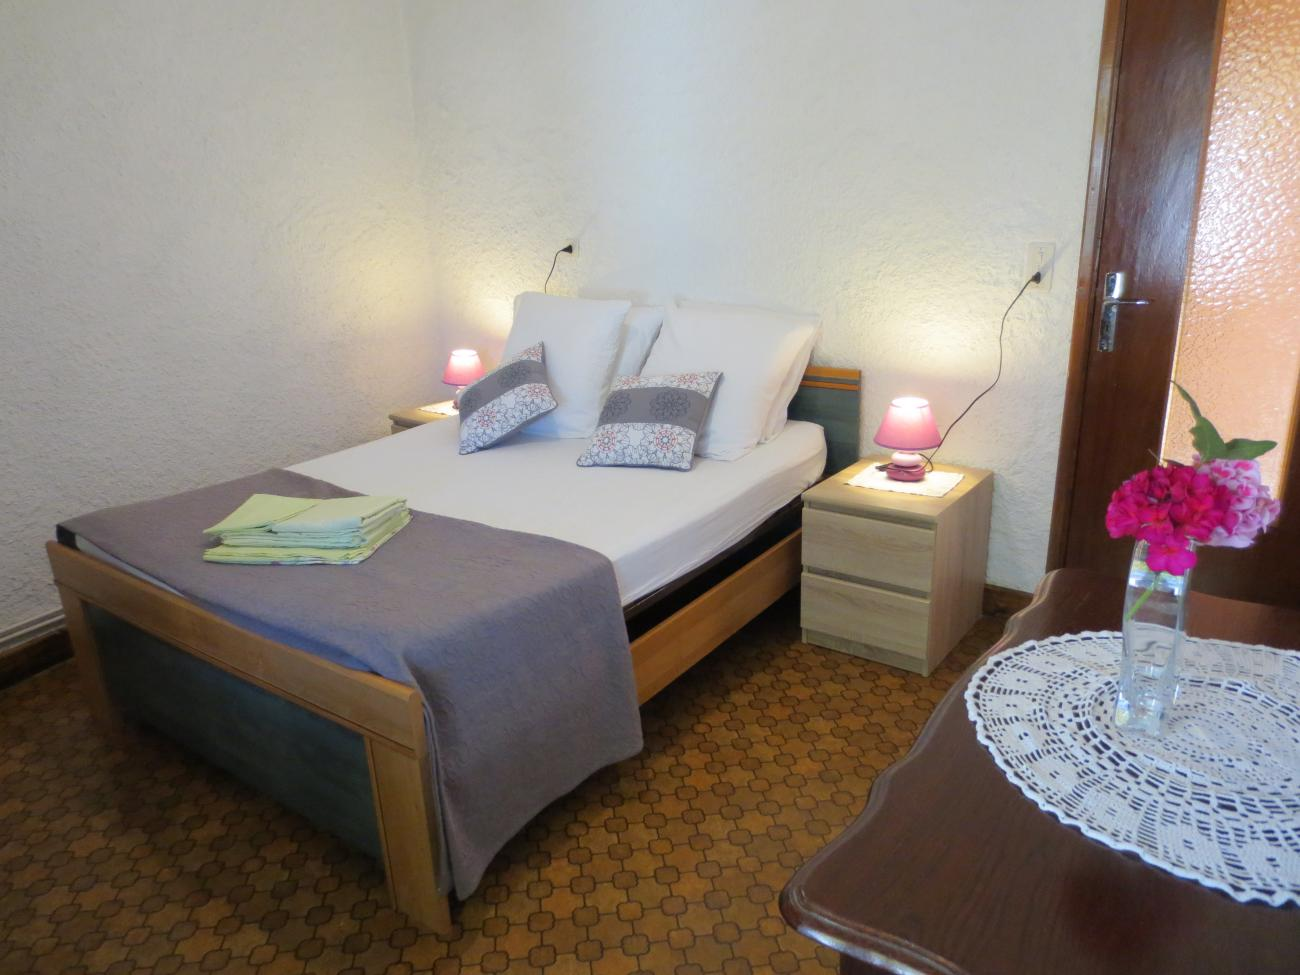 3qg_Chez-Philemon-Chambre-confort4.JPG